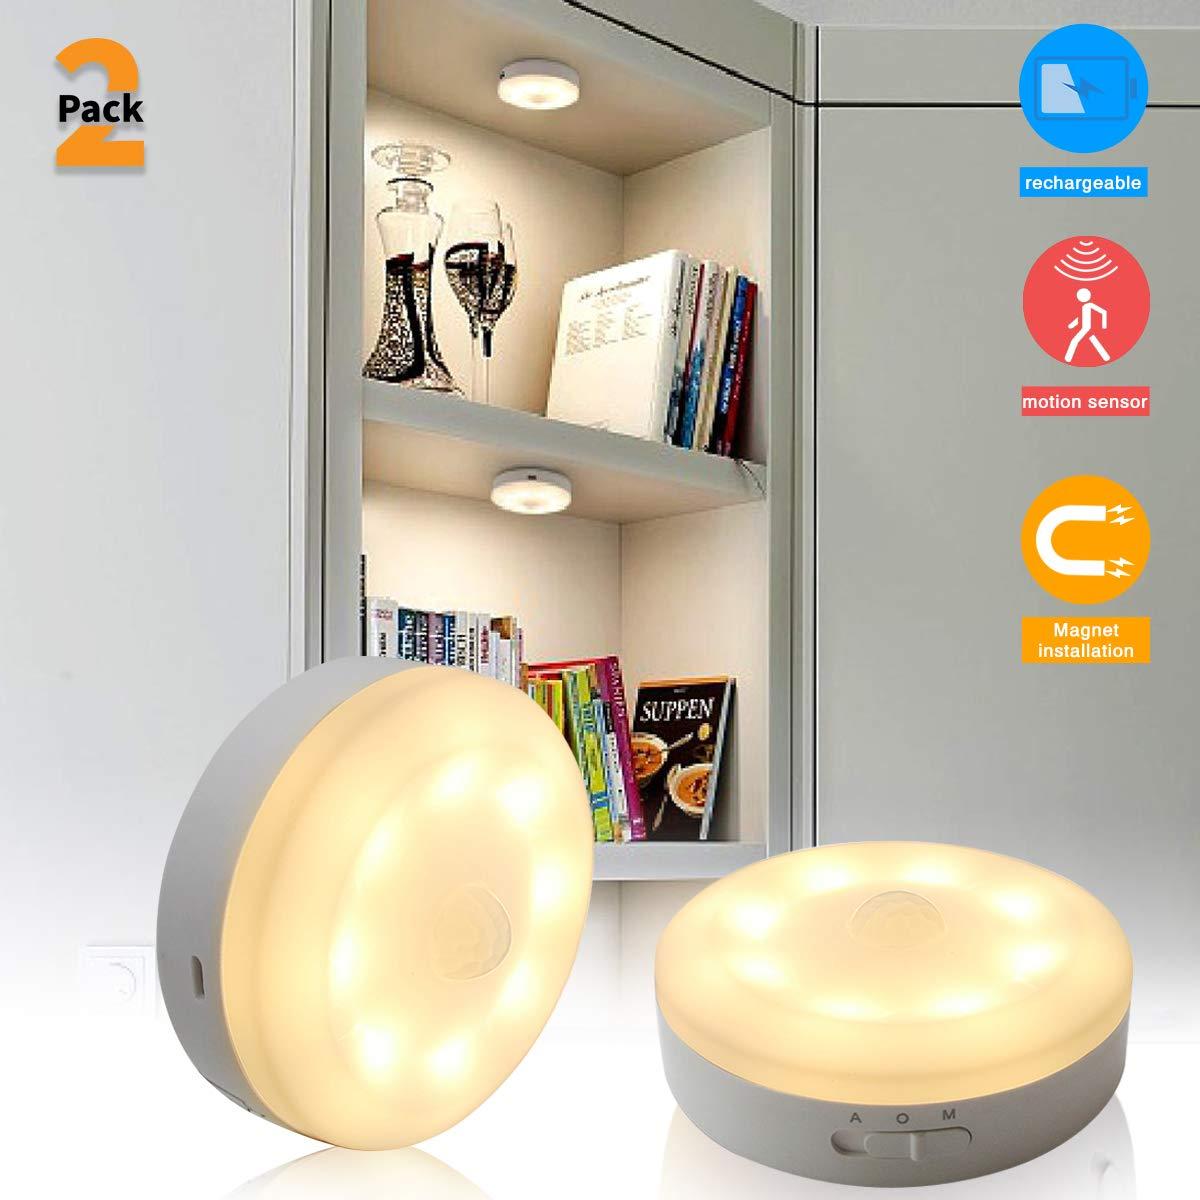 BASON LIGHTING 2019 Upgraded USB Rechargeable Puck Lights,Motion Sensor Under Cabinet Lighting,Wireless Stick on Lights for Hallway, Bathroom, Bedroom, Kitchen, etc.- Soft White 3000K, 2-Pack